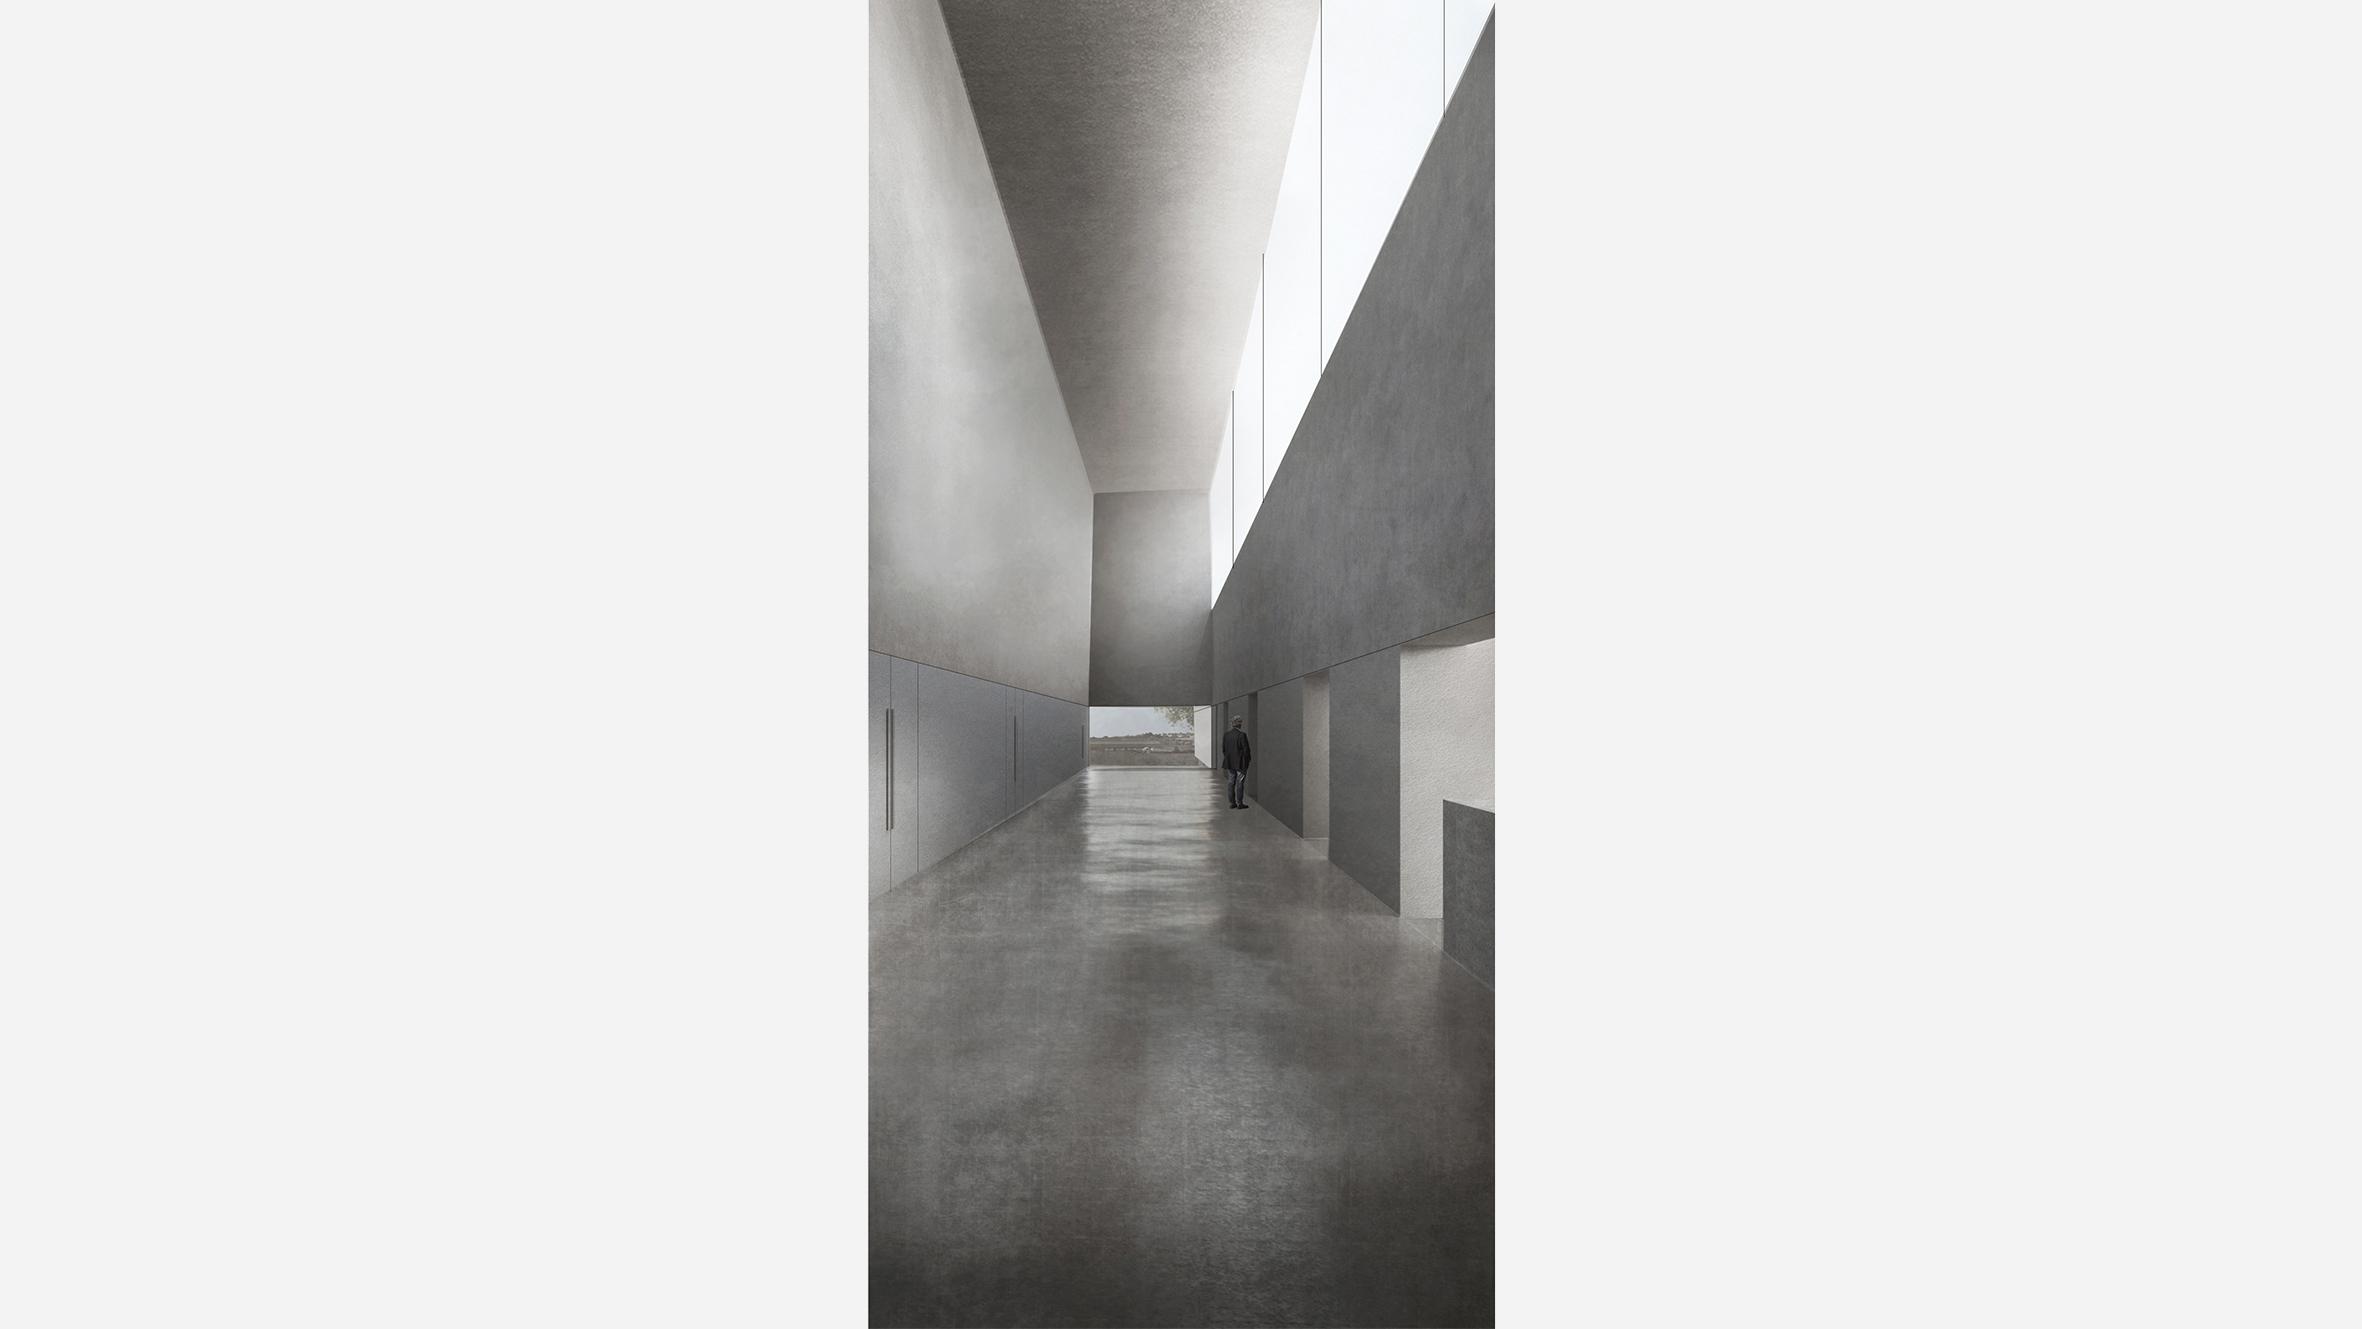 04_IMAGEN vertical pasillo